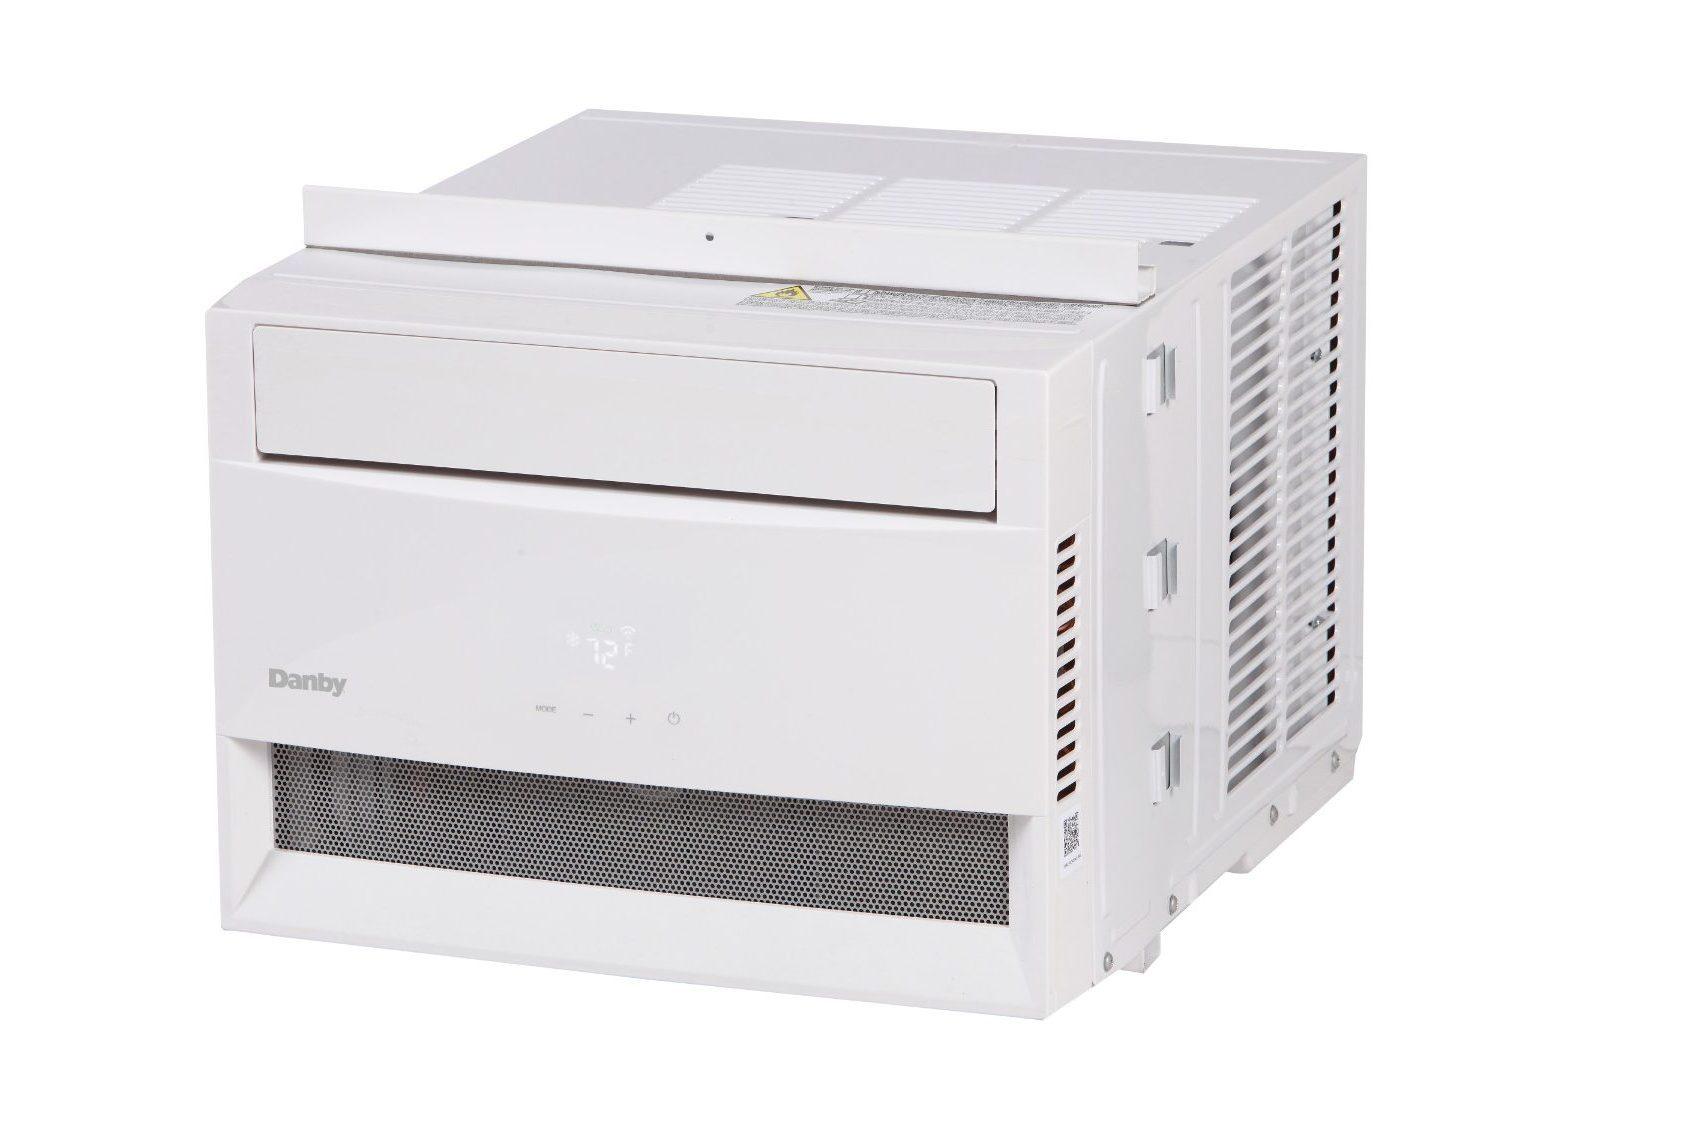 DAC080B5WDB